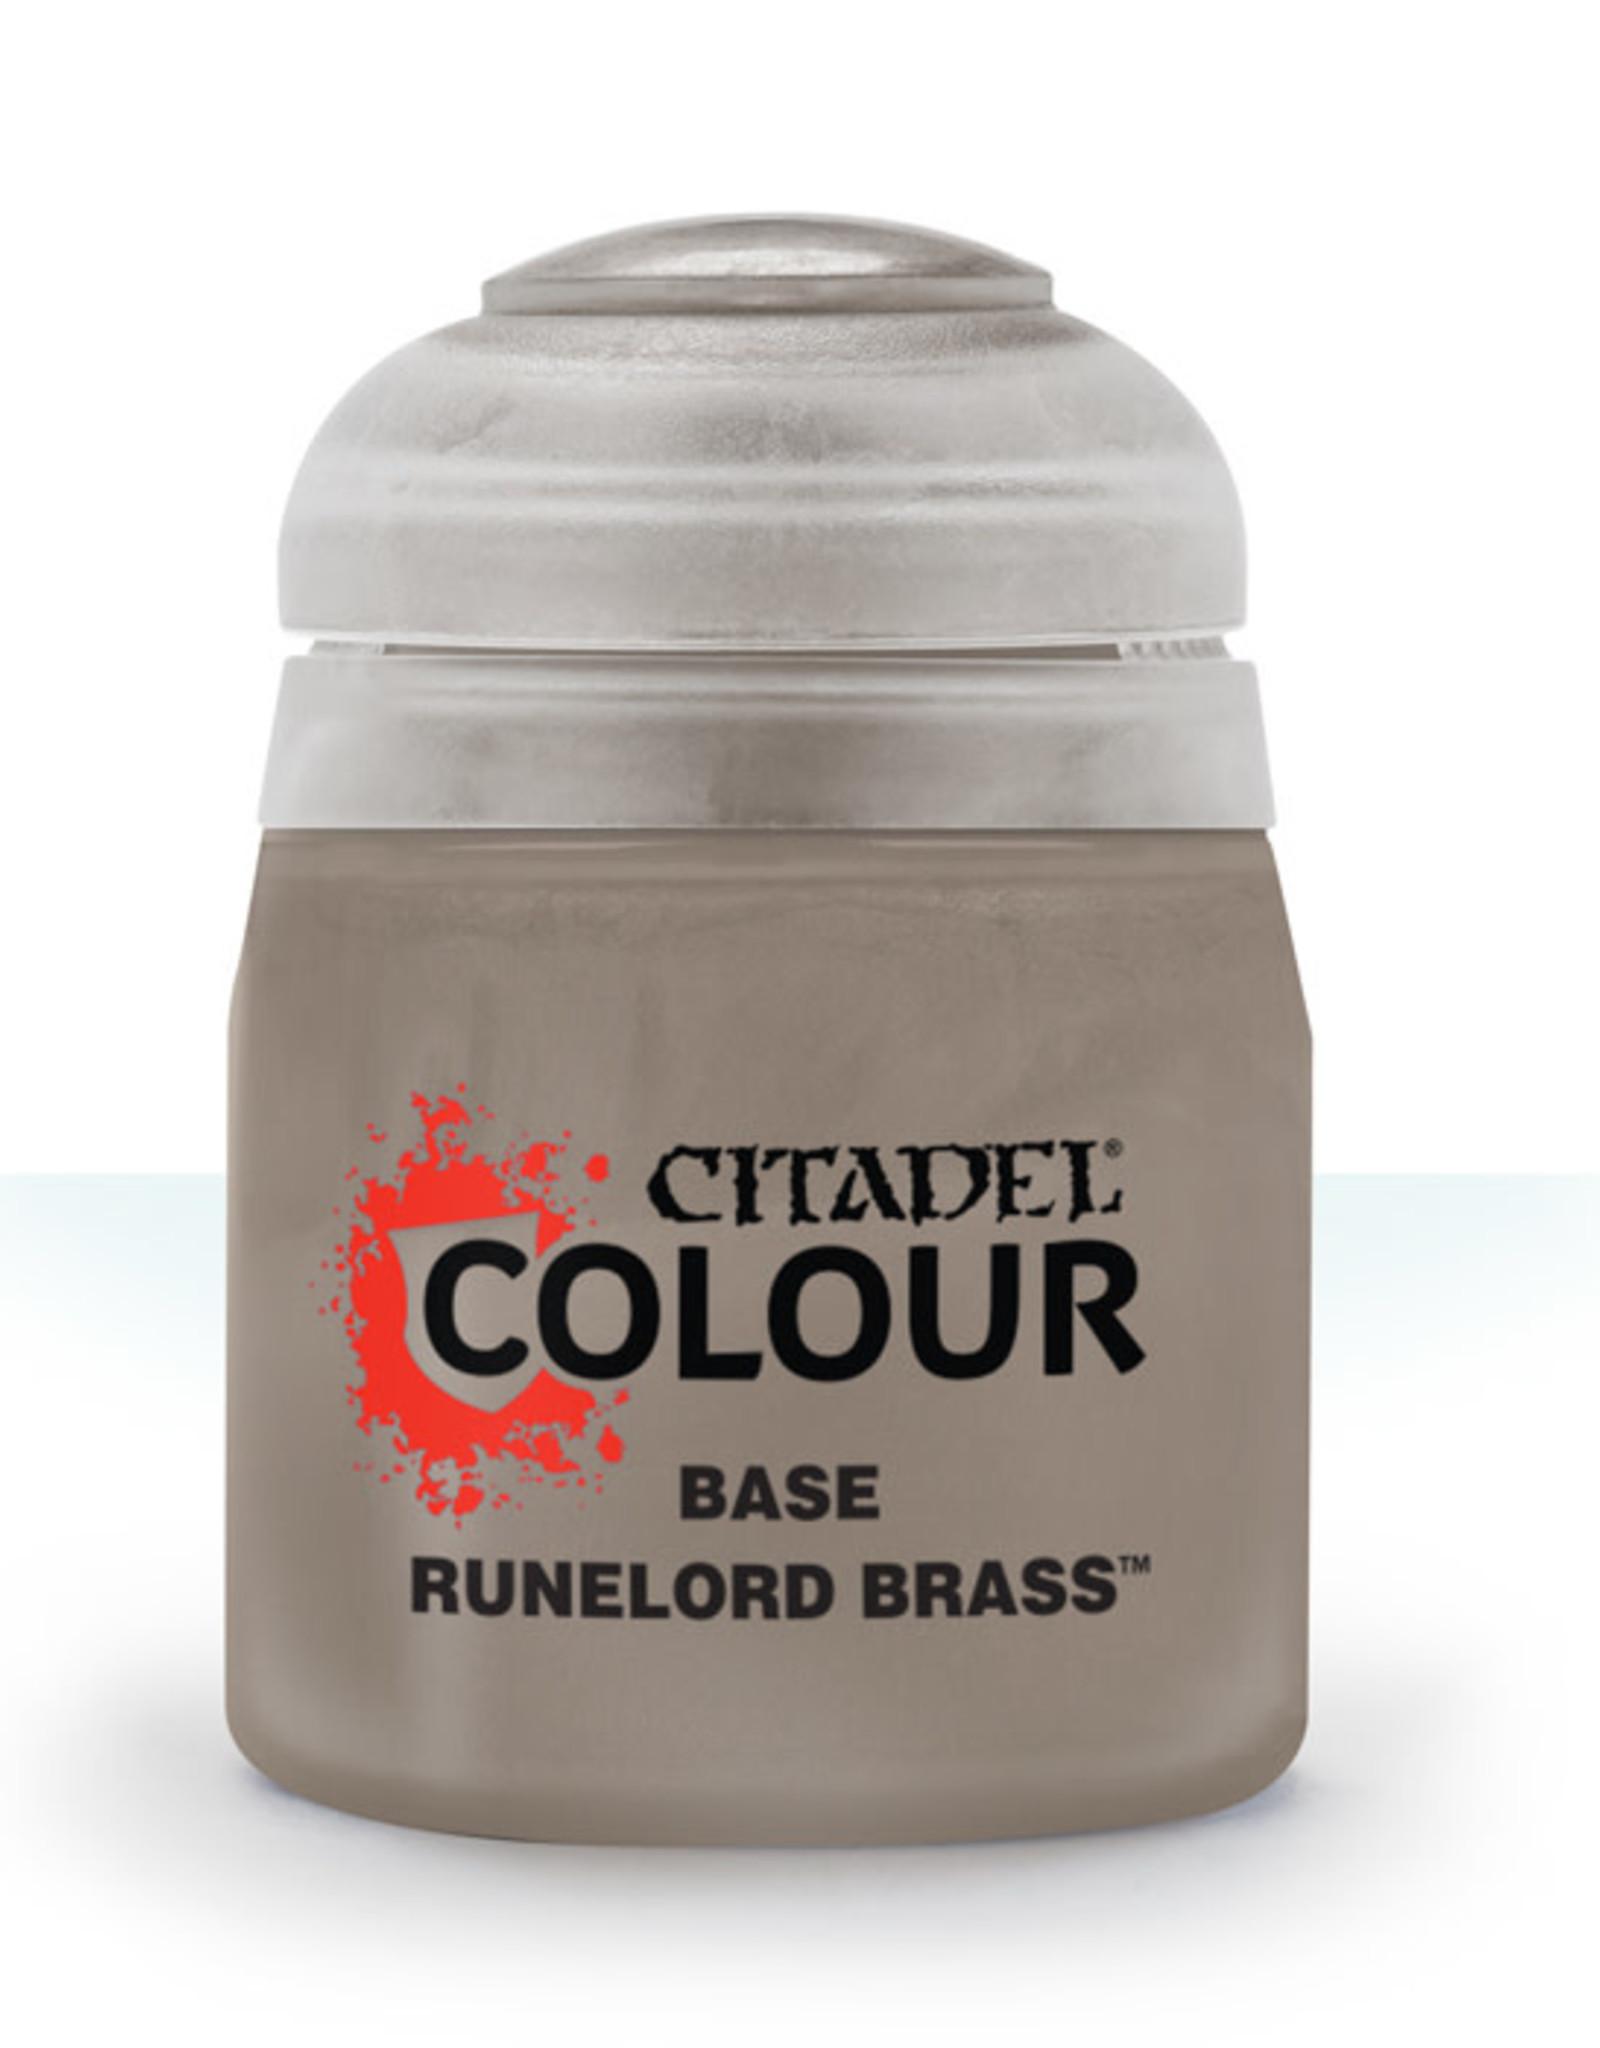 Citadel Citadel Colour: Base - Runelord Brass